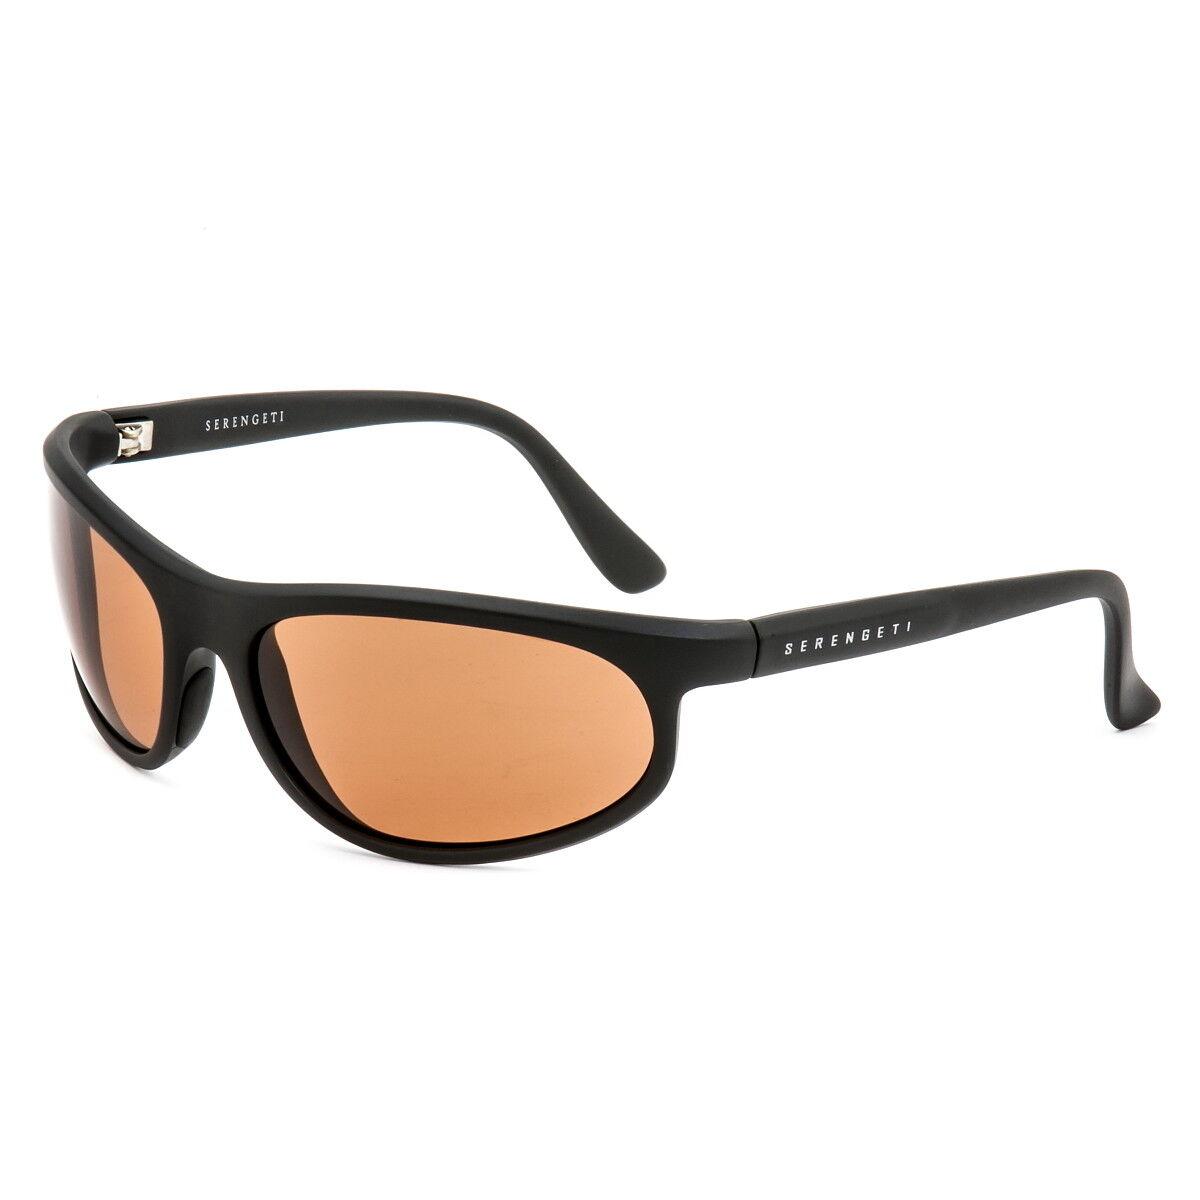 Serengeti Summit Drivers Sunglasses